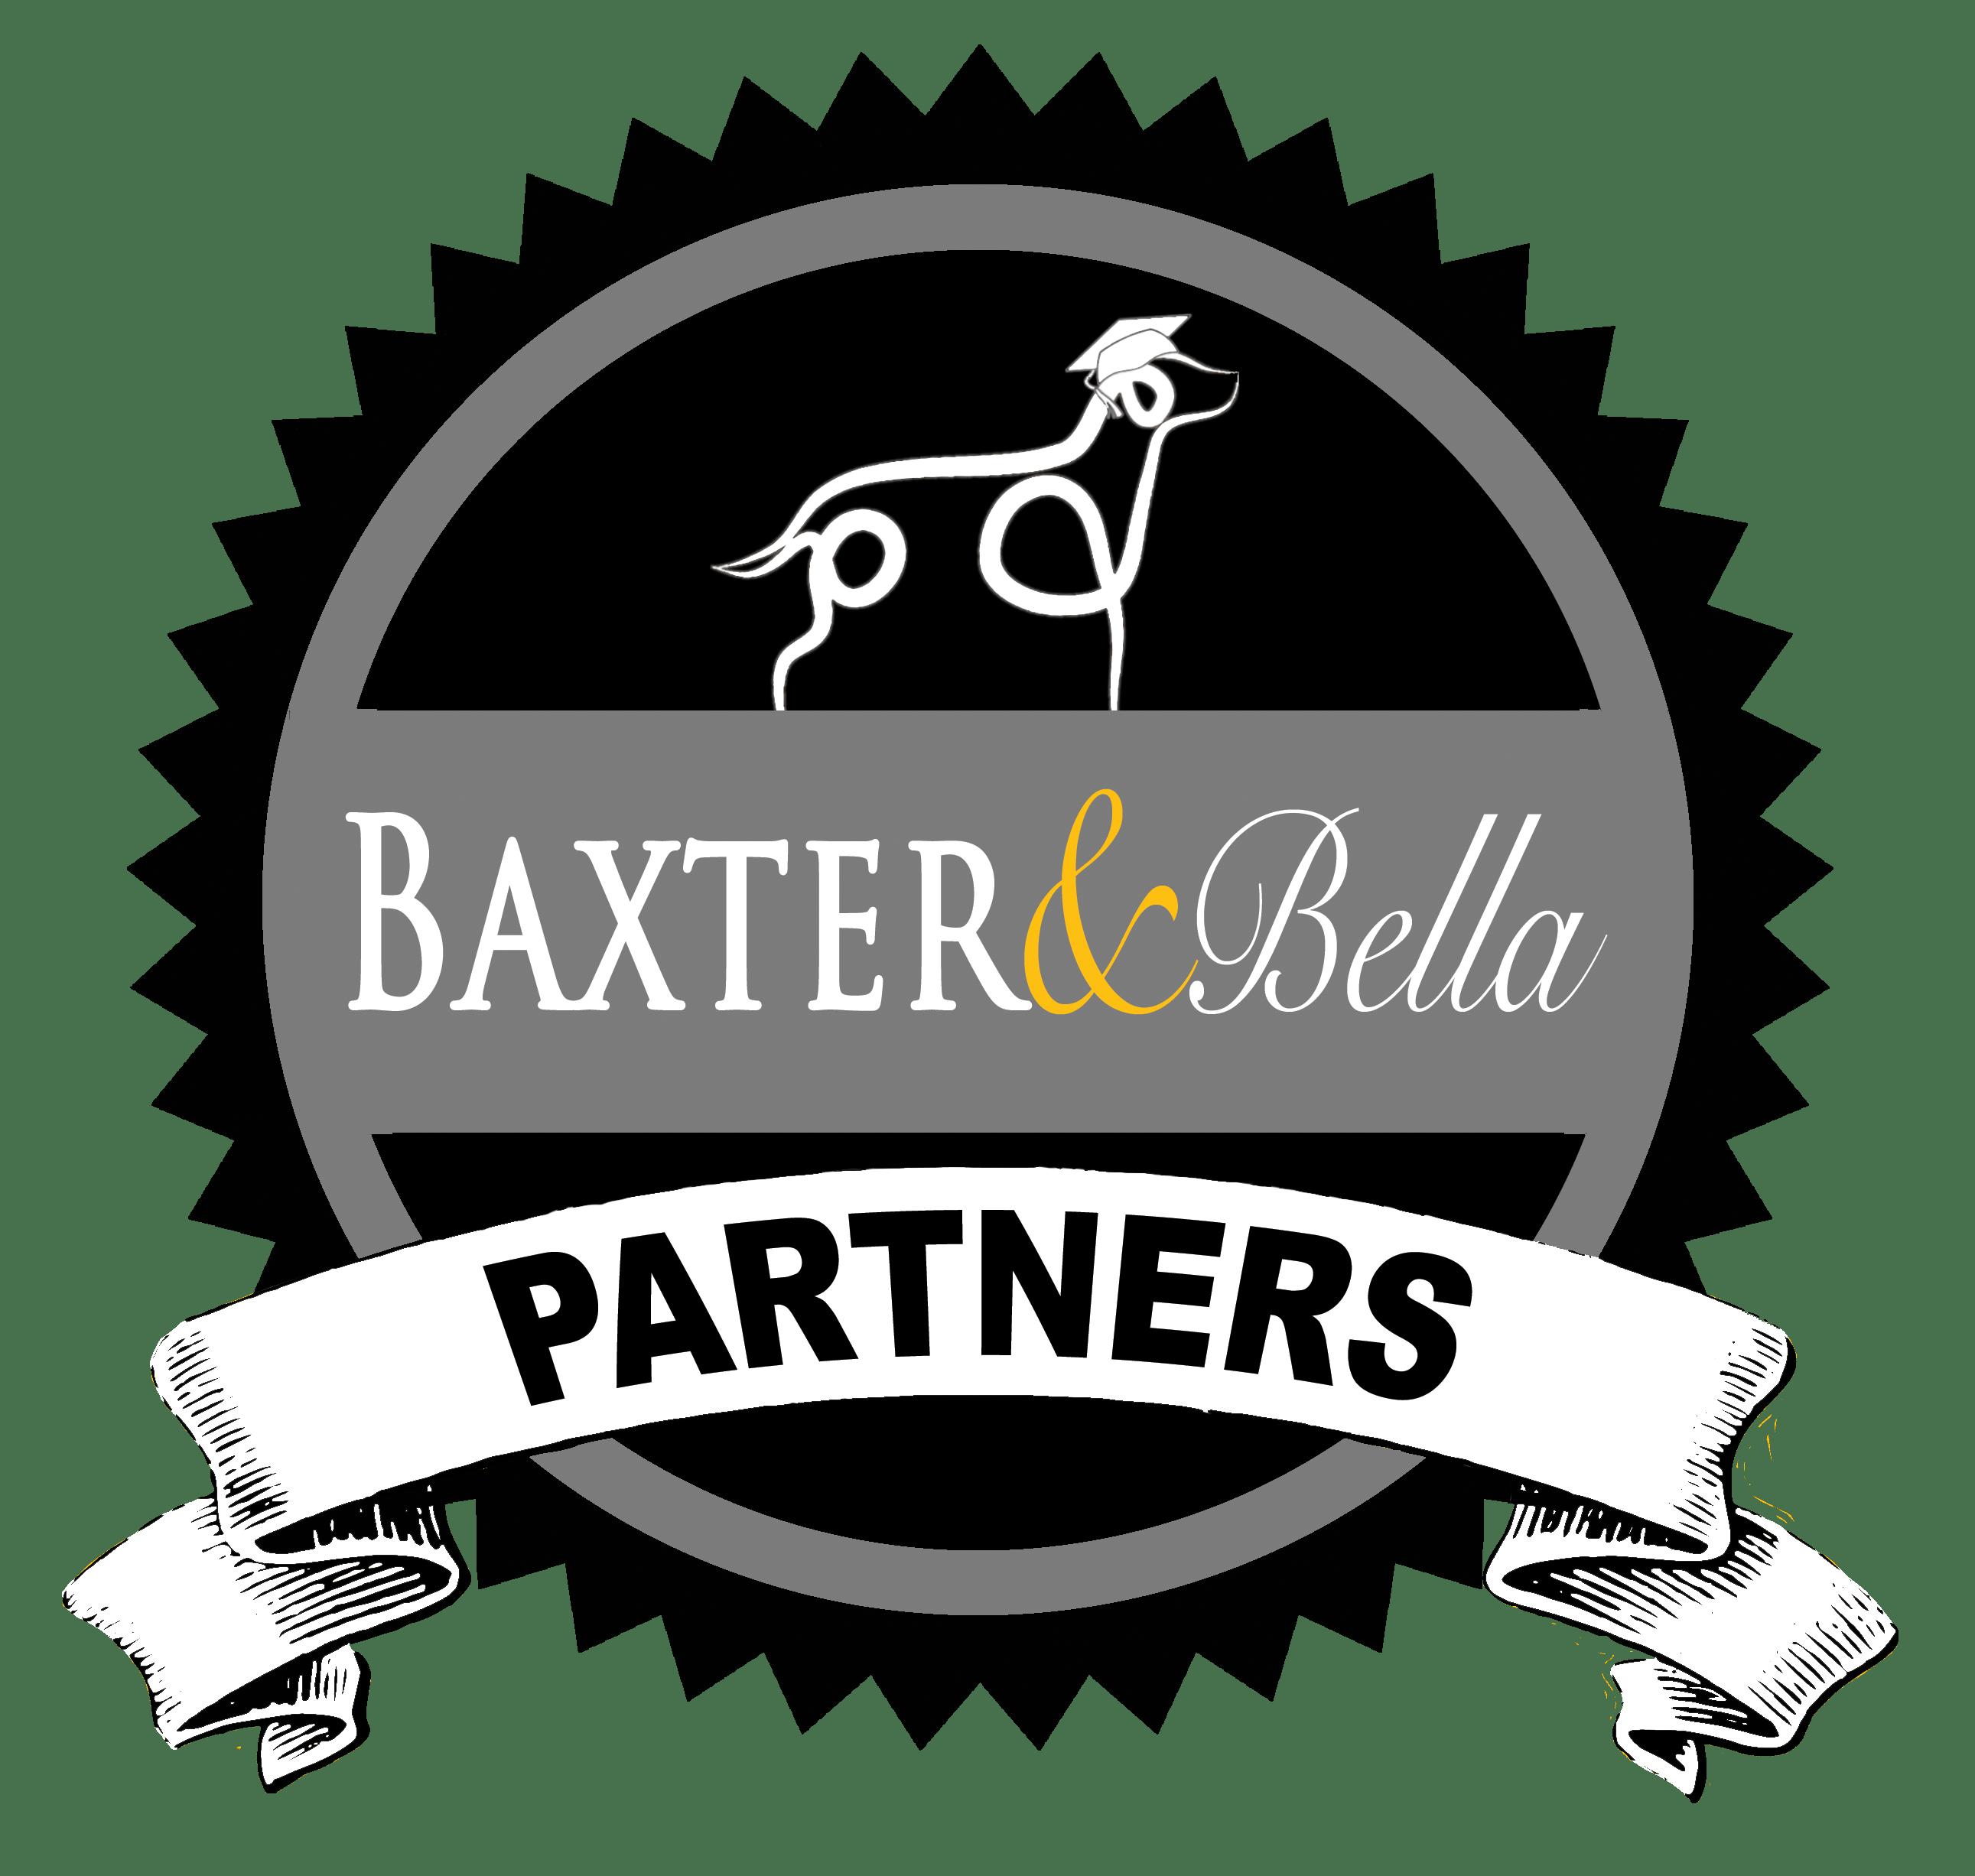 Drawing of dog over BAXTER & Bella logo